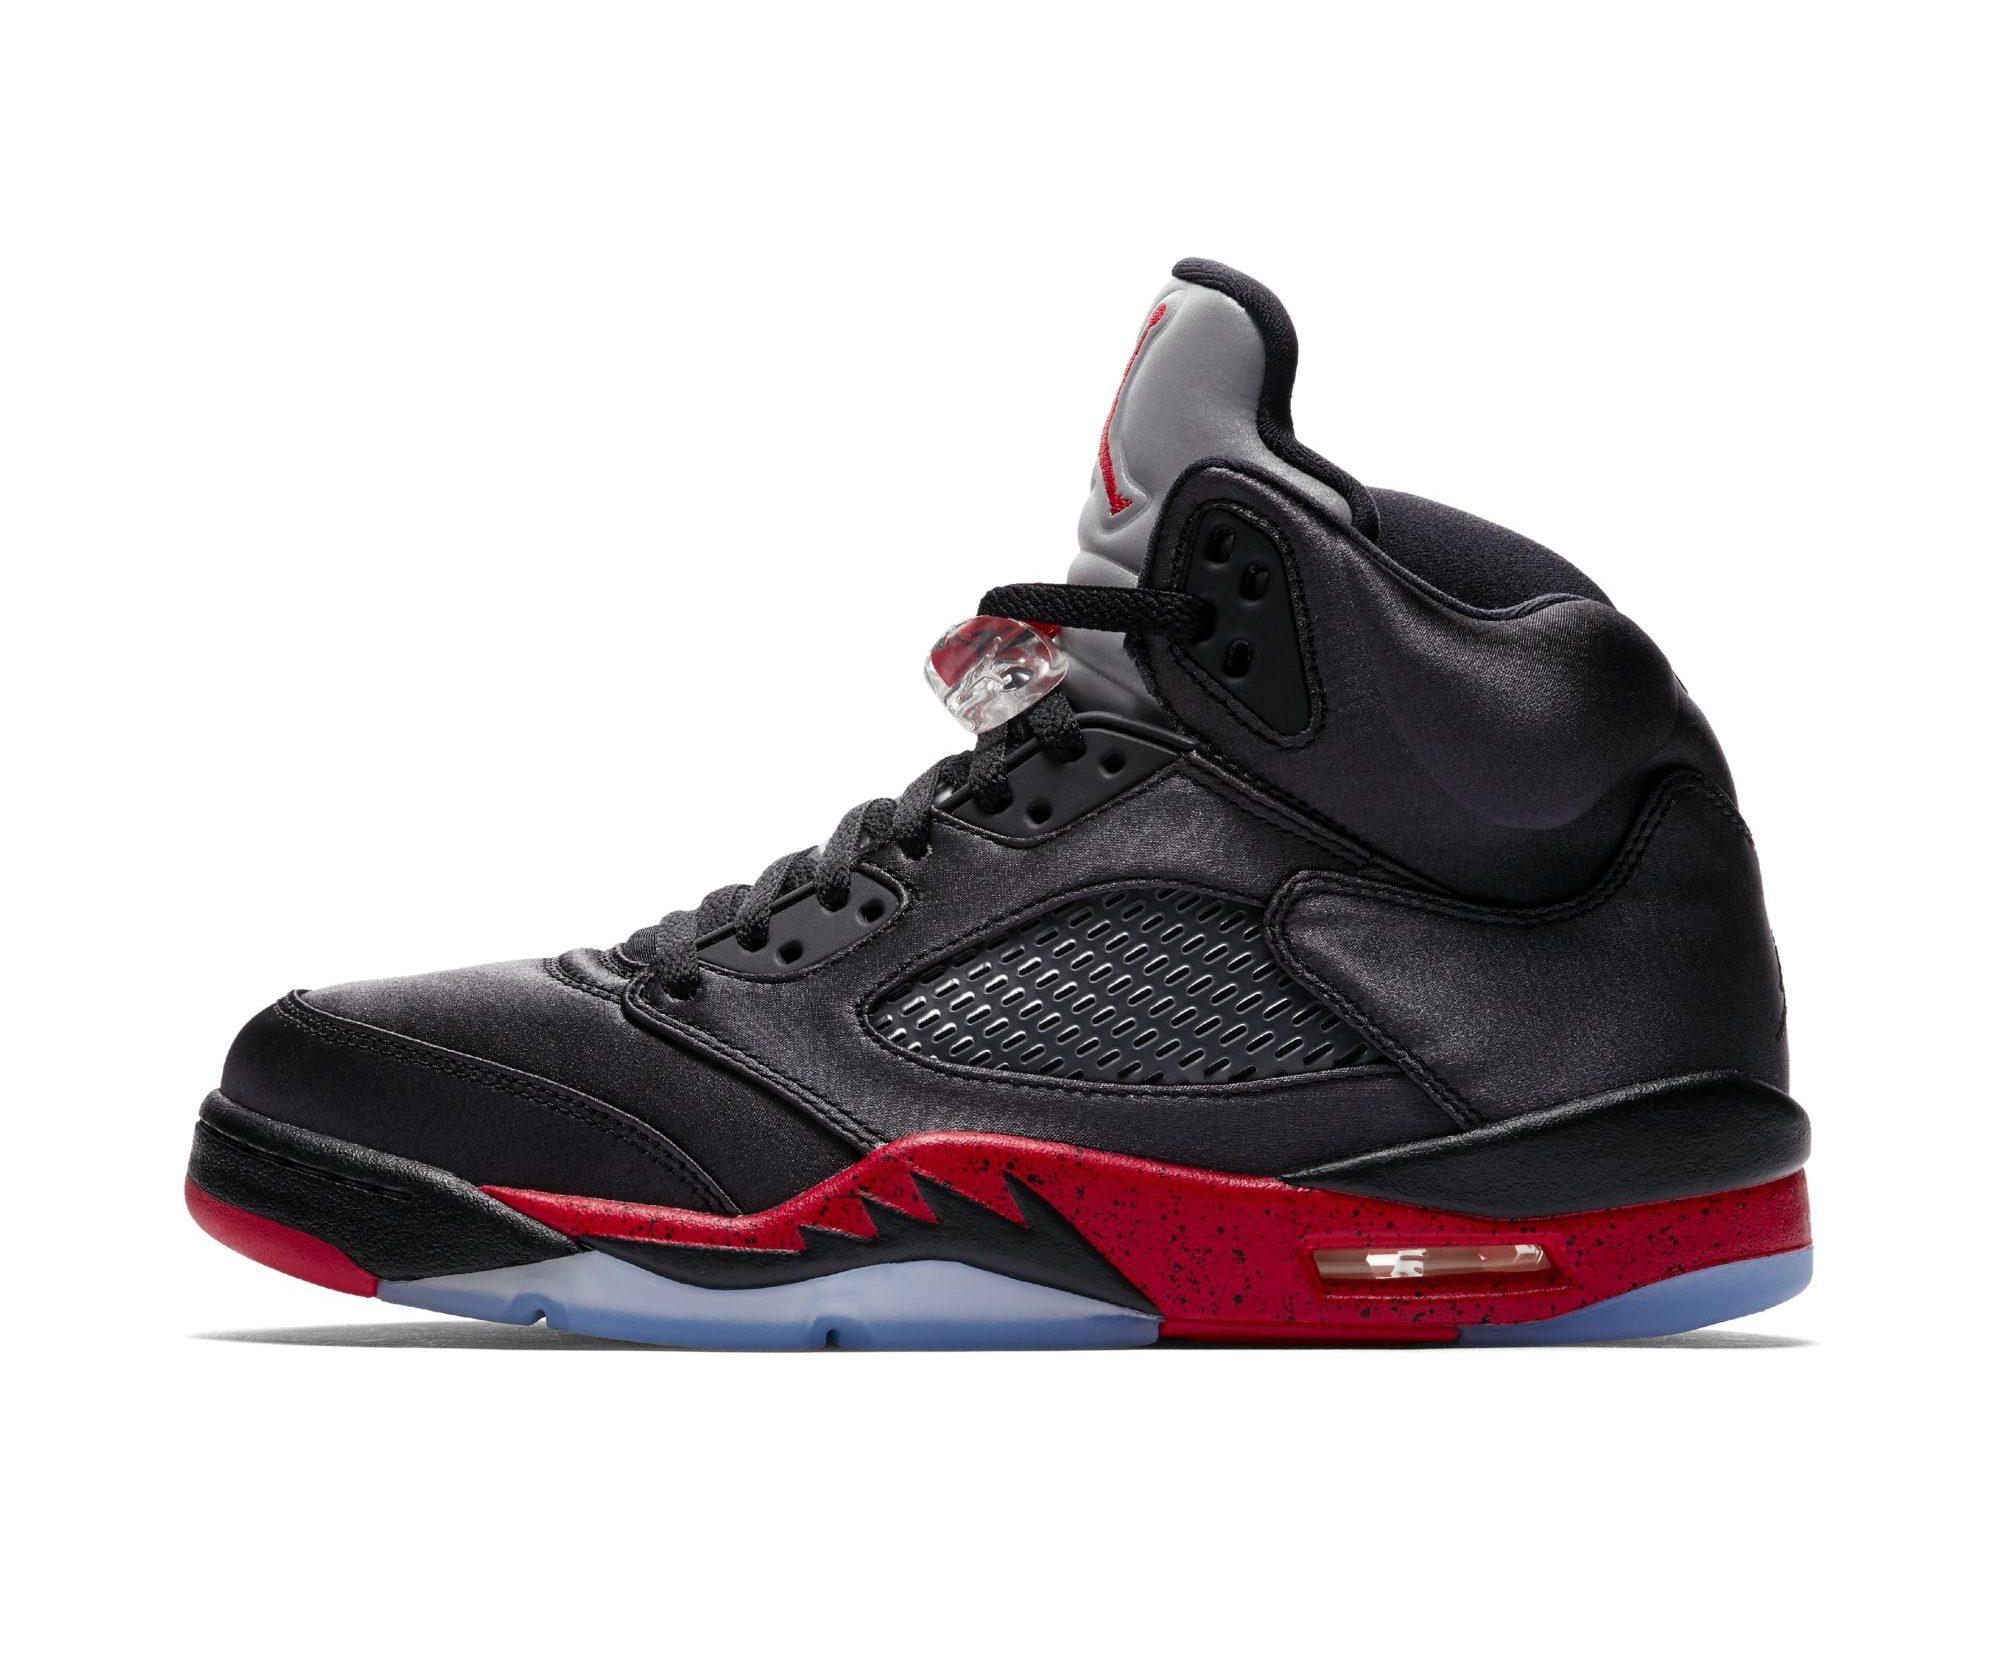 meet 13bee 493df Official Look at the Satin Air Jordan 5 'Black/Red ...